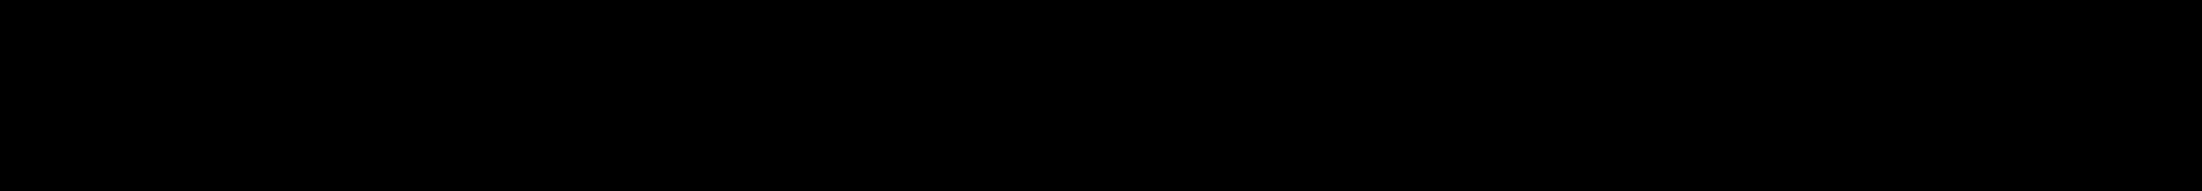 Korataki Extra Light Italic